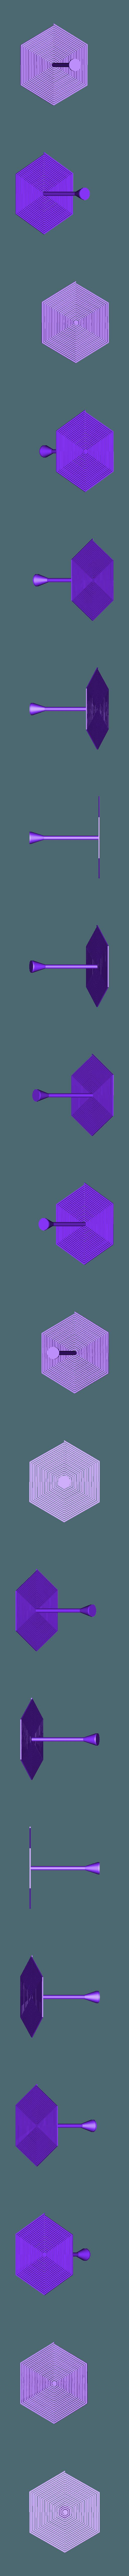 50mm_Hex_Spiral_Tree.stl Download free SCAD file Customizable Spiral Tree • Design to 3D print, WalterHsiao